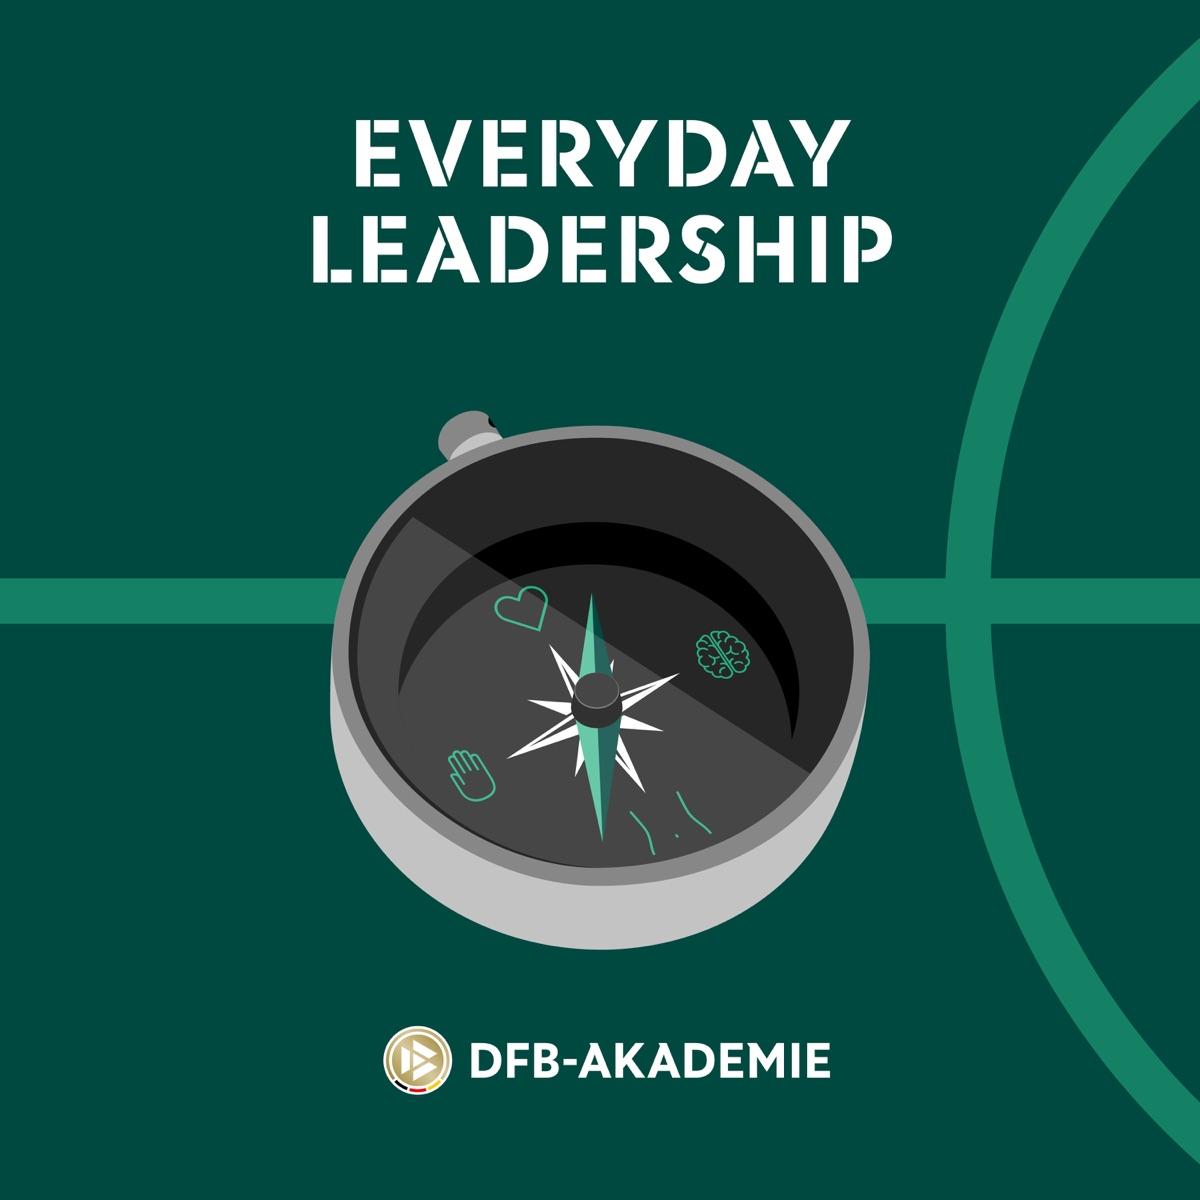 Everyday Leadership - der Leadership-Talk der DFB-Akademie